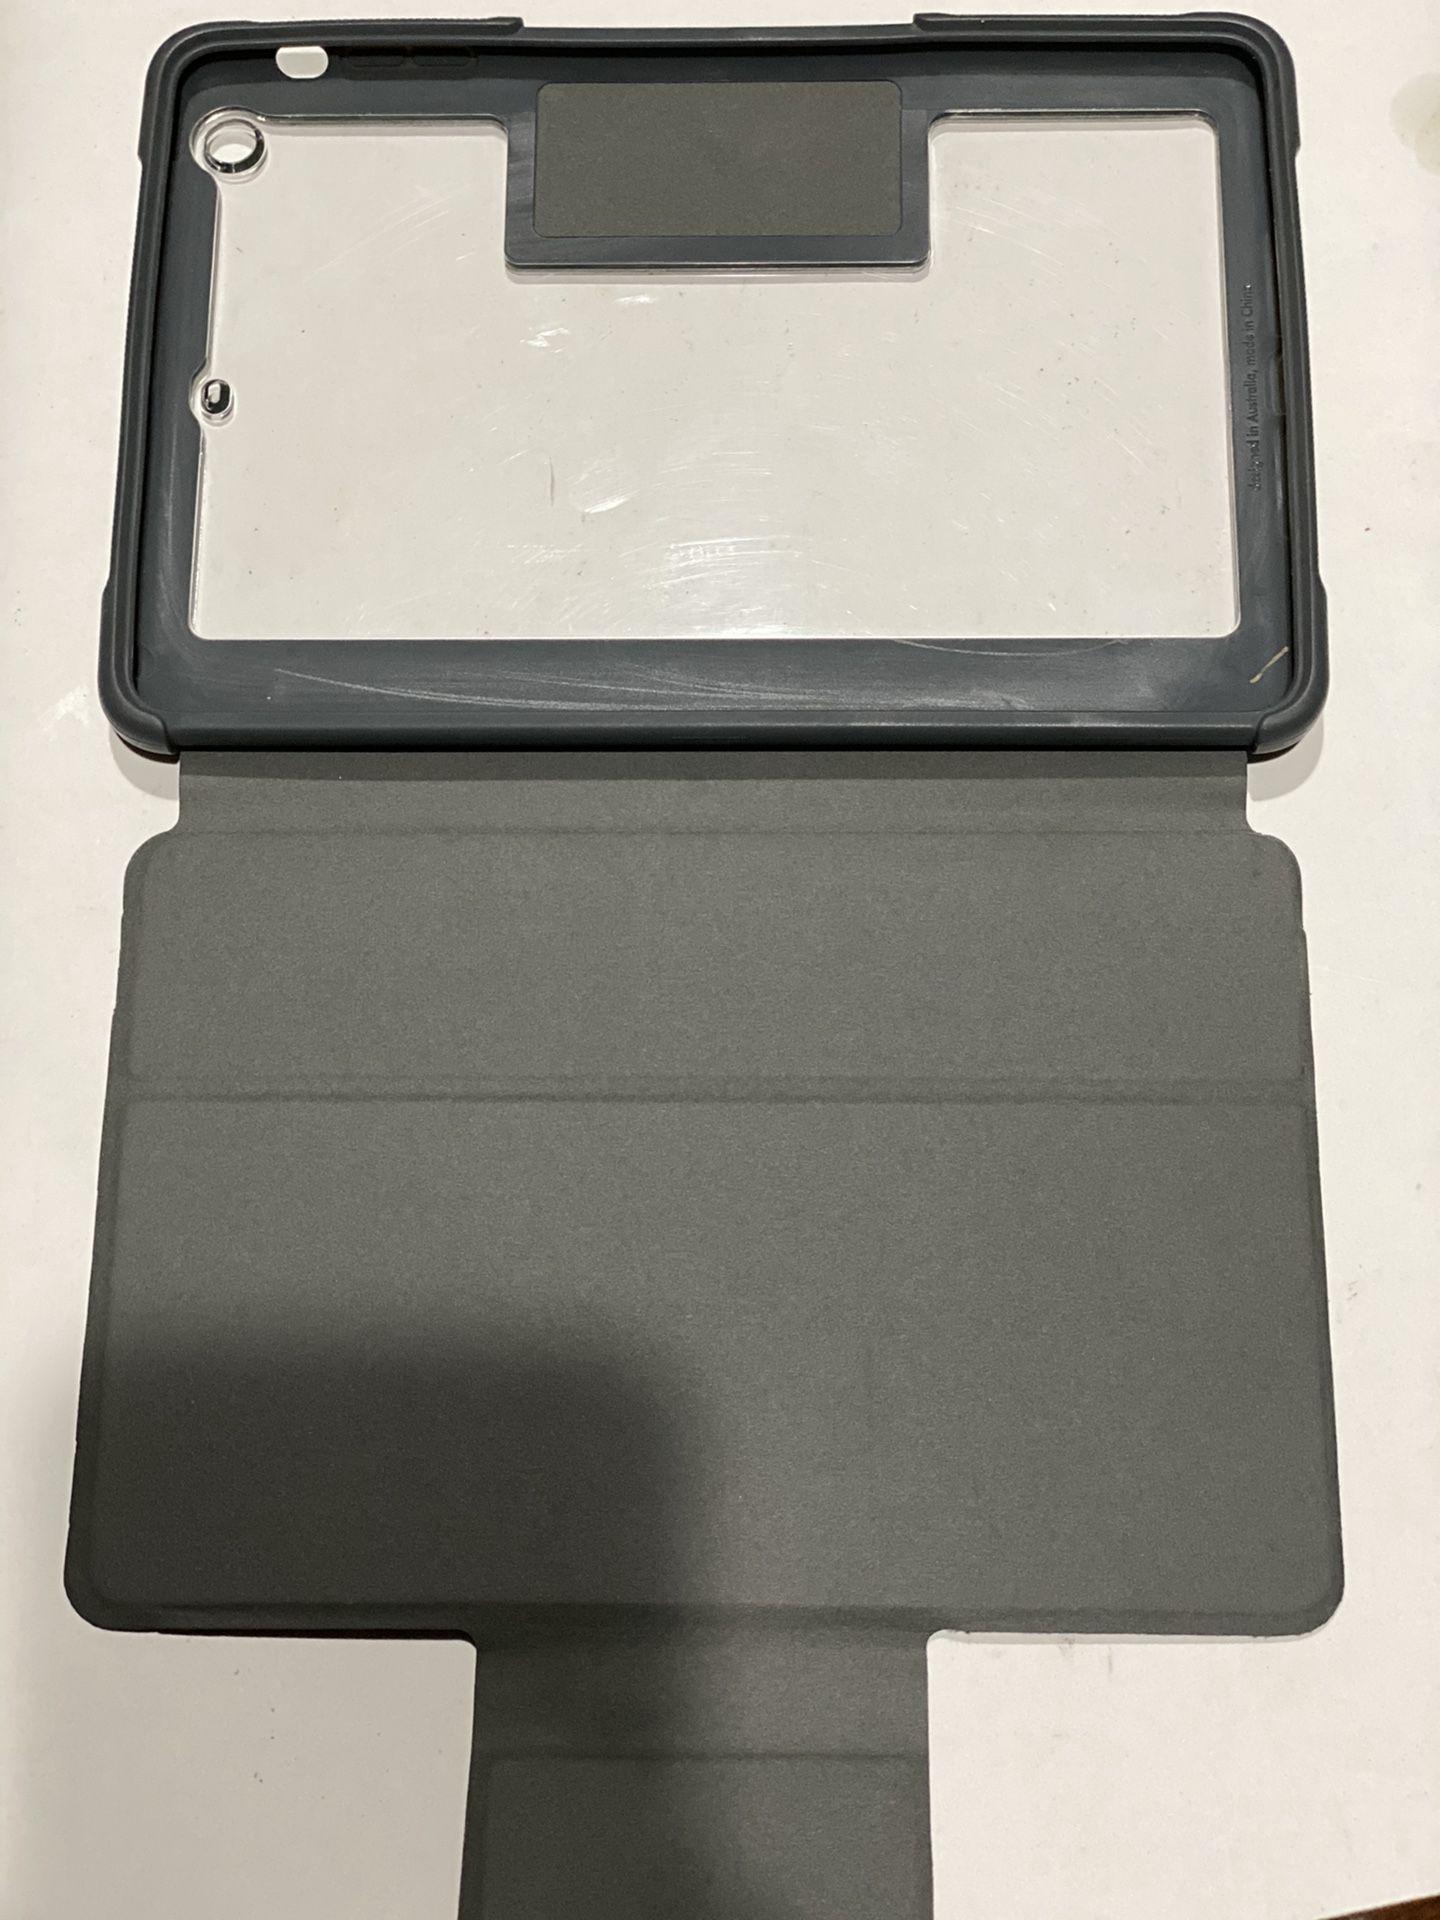 iPad Mini Protector Case Dark/Gray